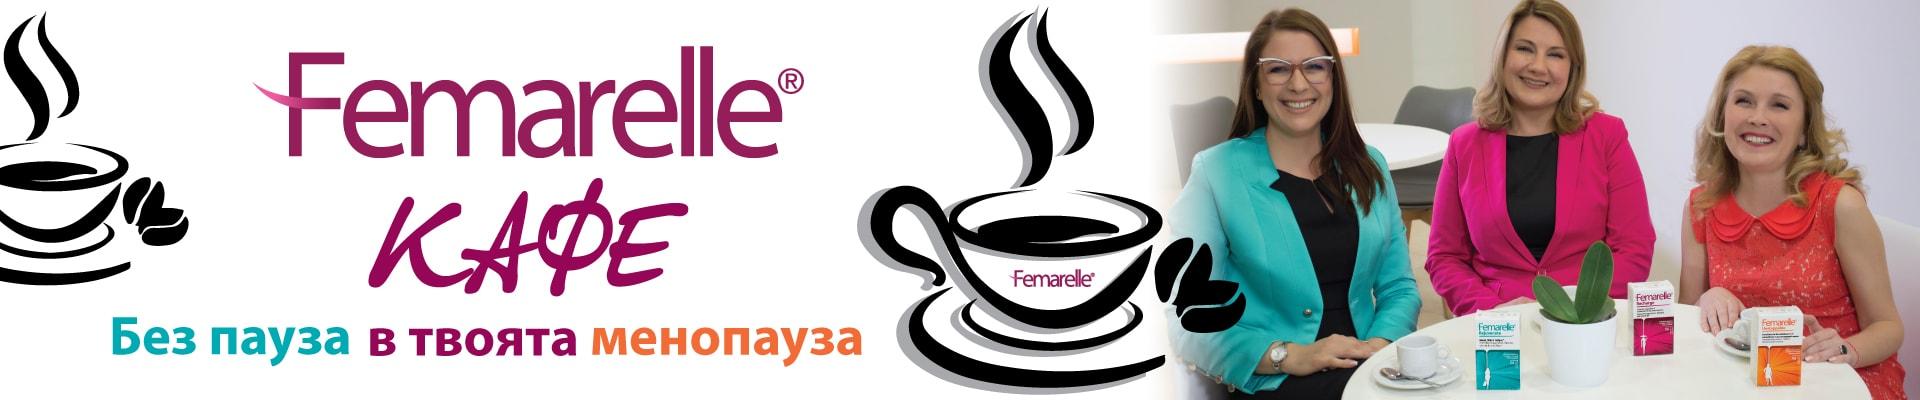 femarelle_kafe